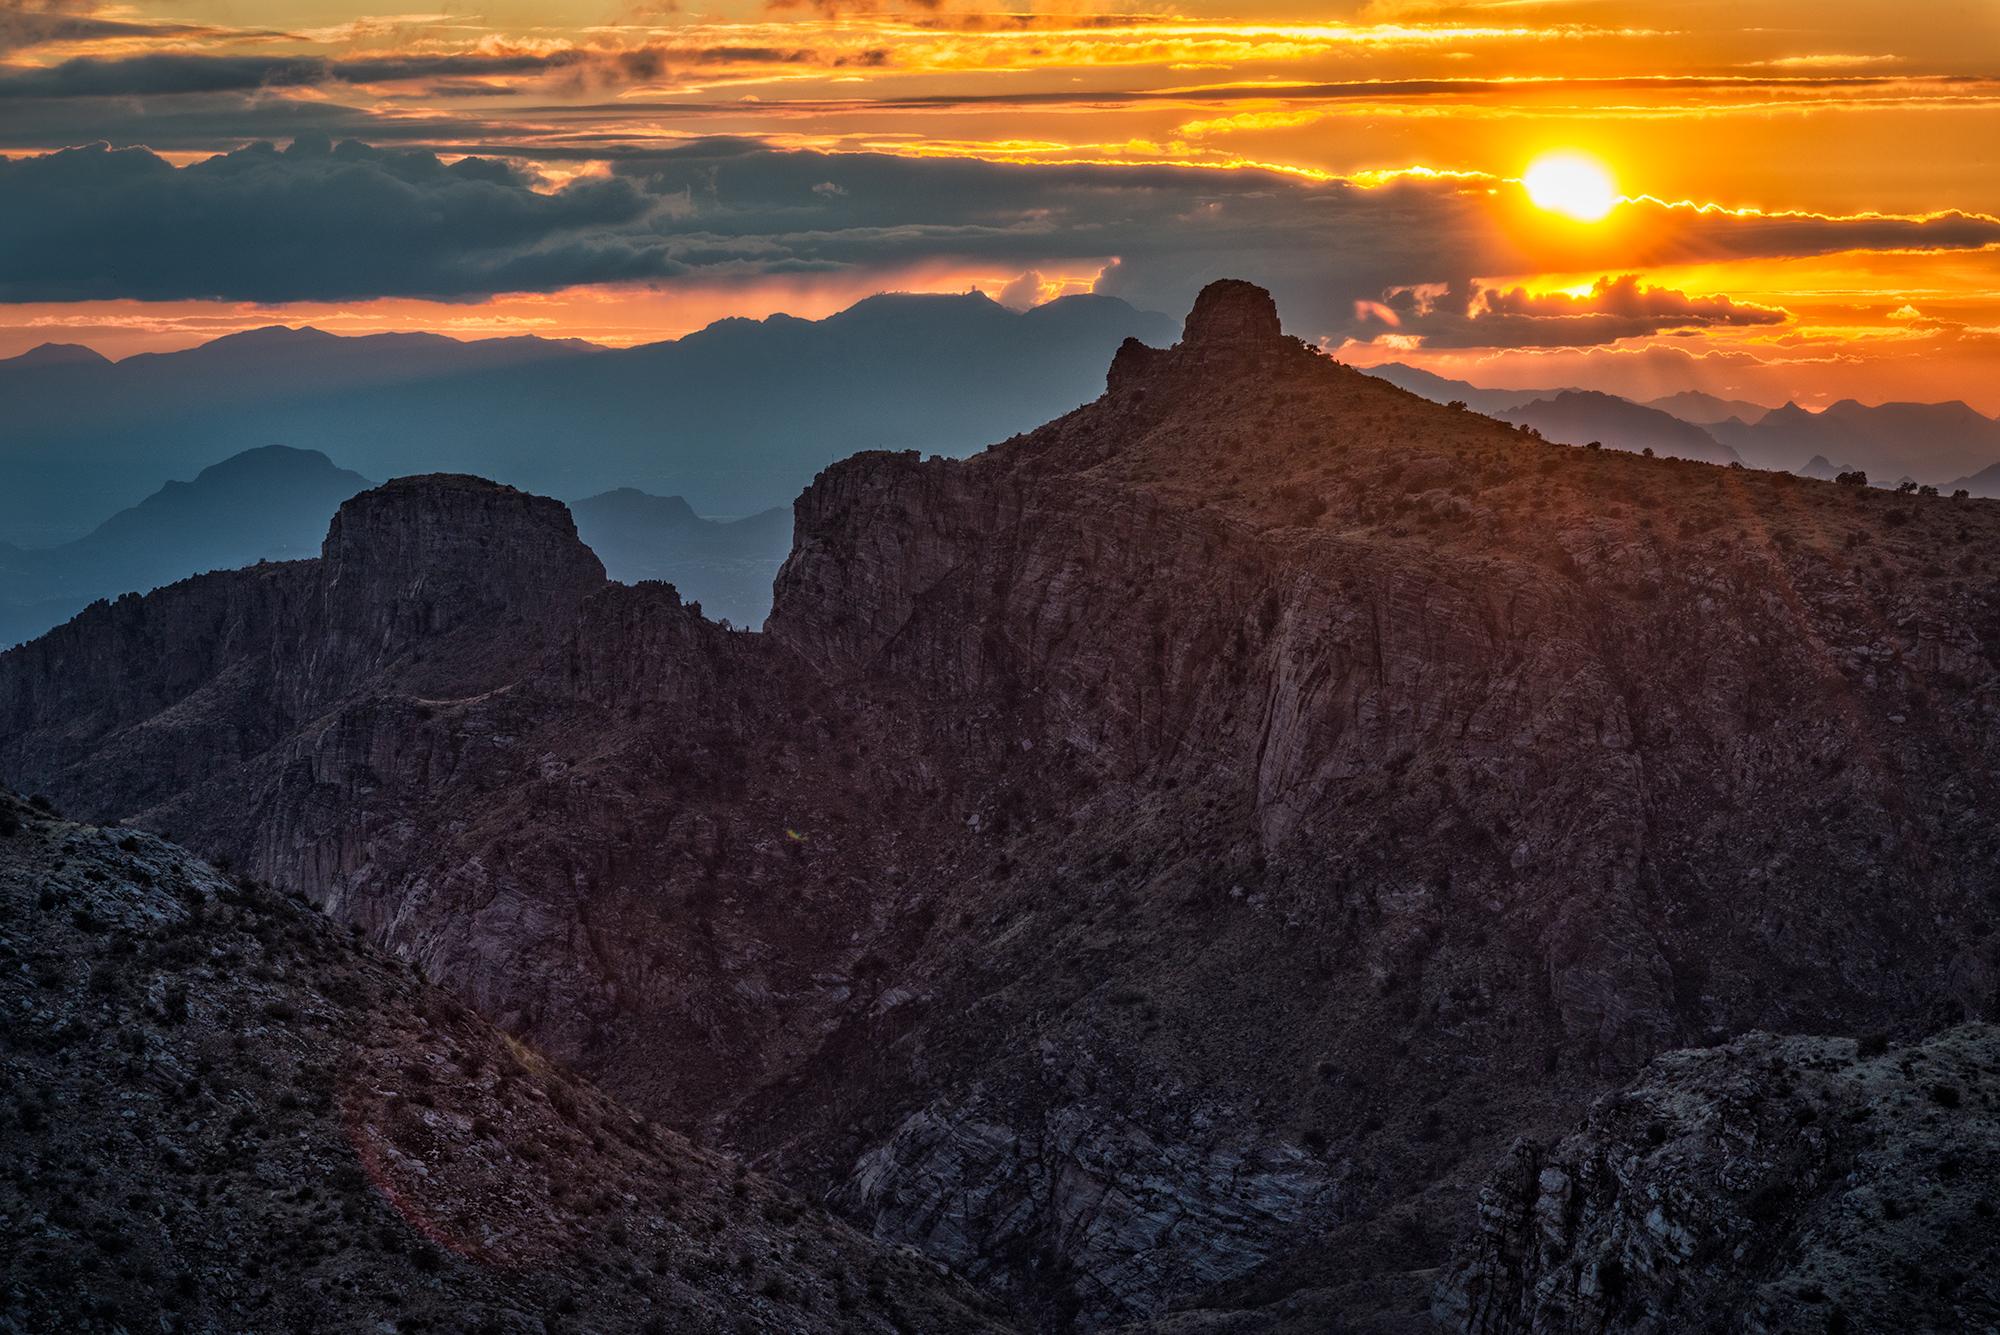 Thimble Peak Sunset, #4. Catalina Mountains, Tucson, Arizona, 2017